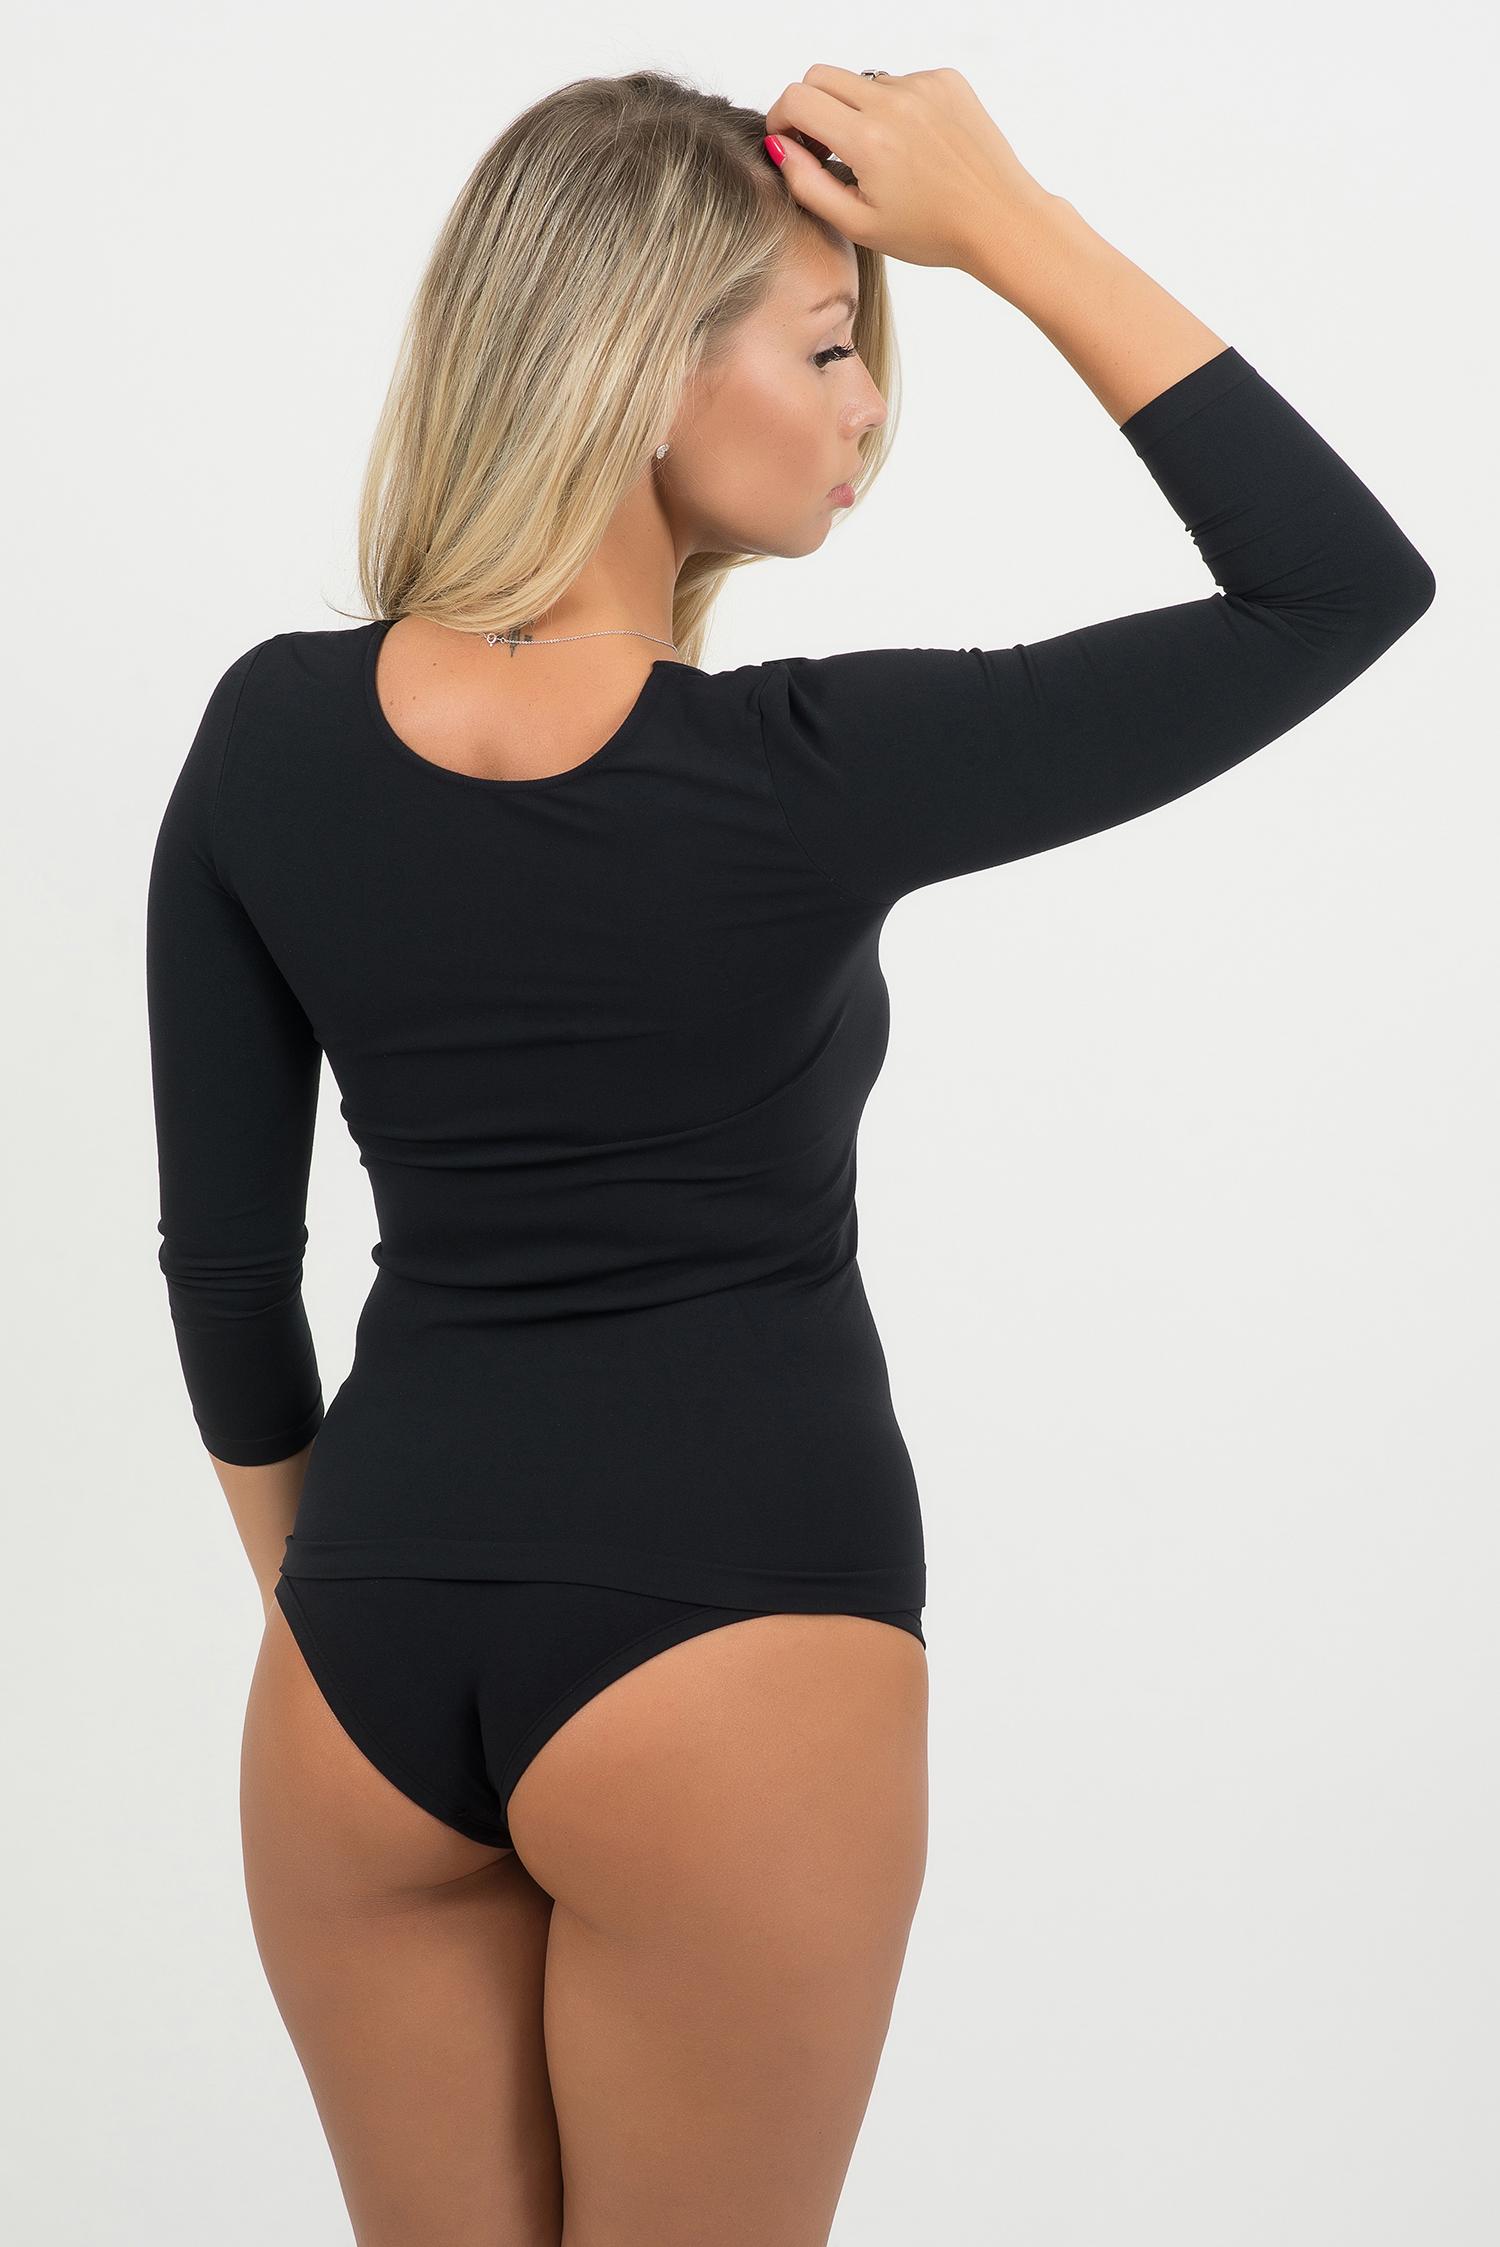 Bellissima-Women-039-s-3-4-Sleeve-Scoop-Neck-T-Shirt-Seamless-Stretch-Basic-Top thumbnail 10